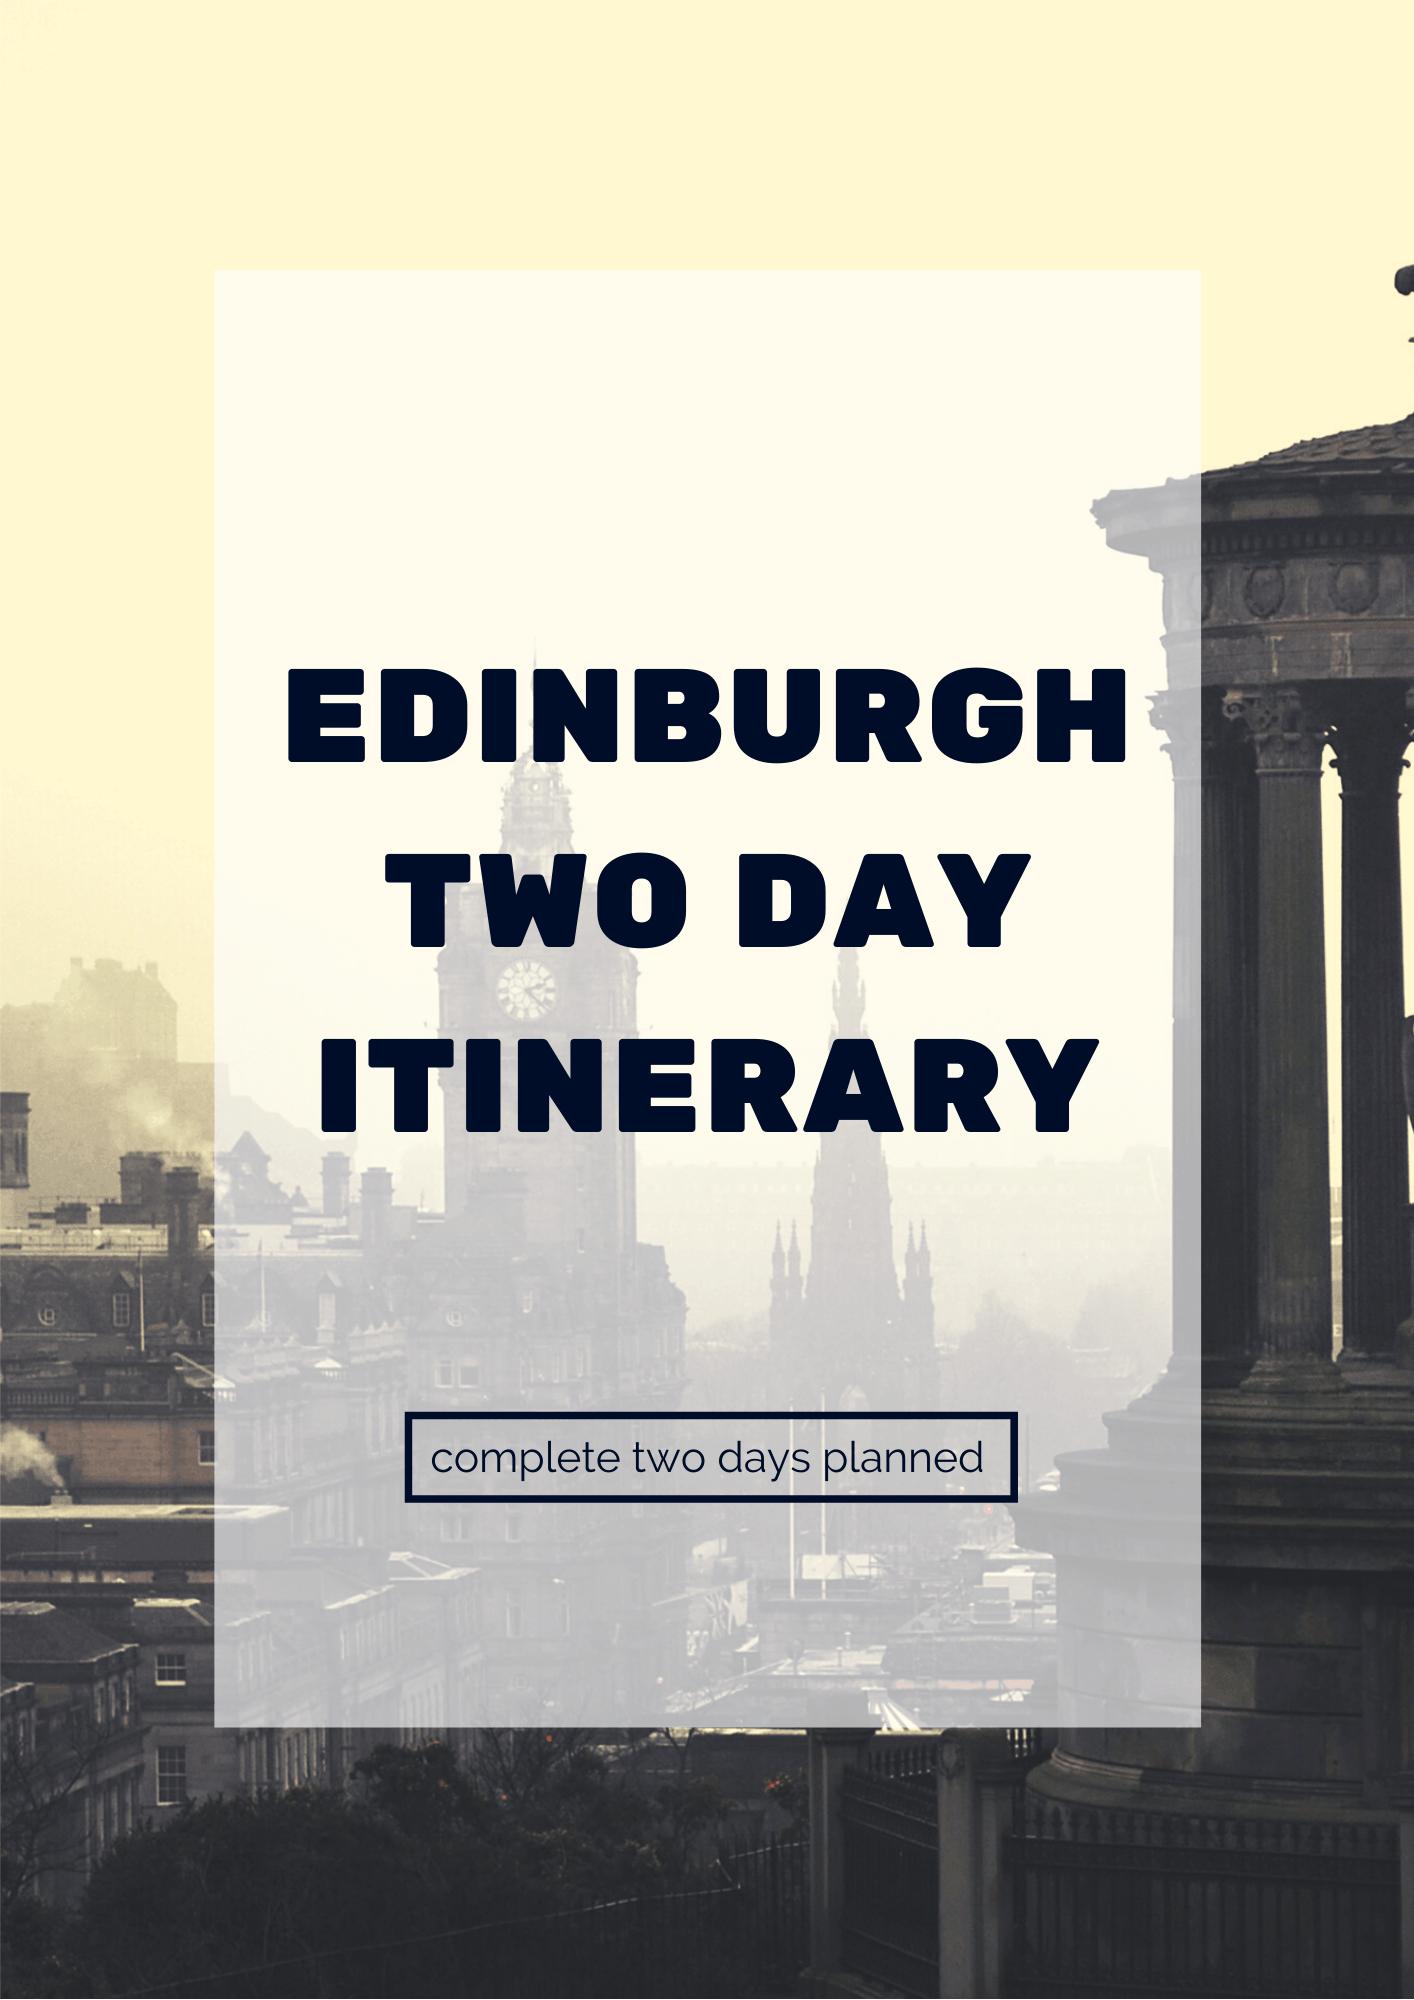 Edinburgh Two Day Itinerary 2019